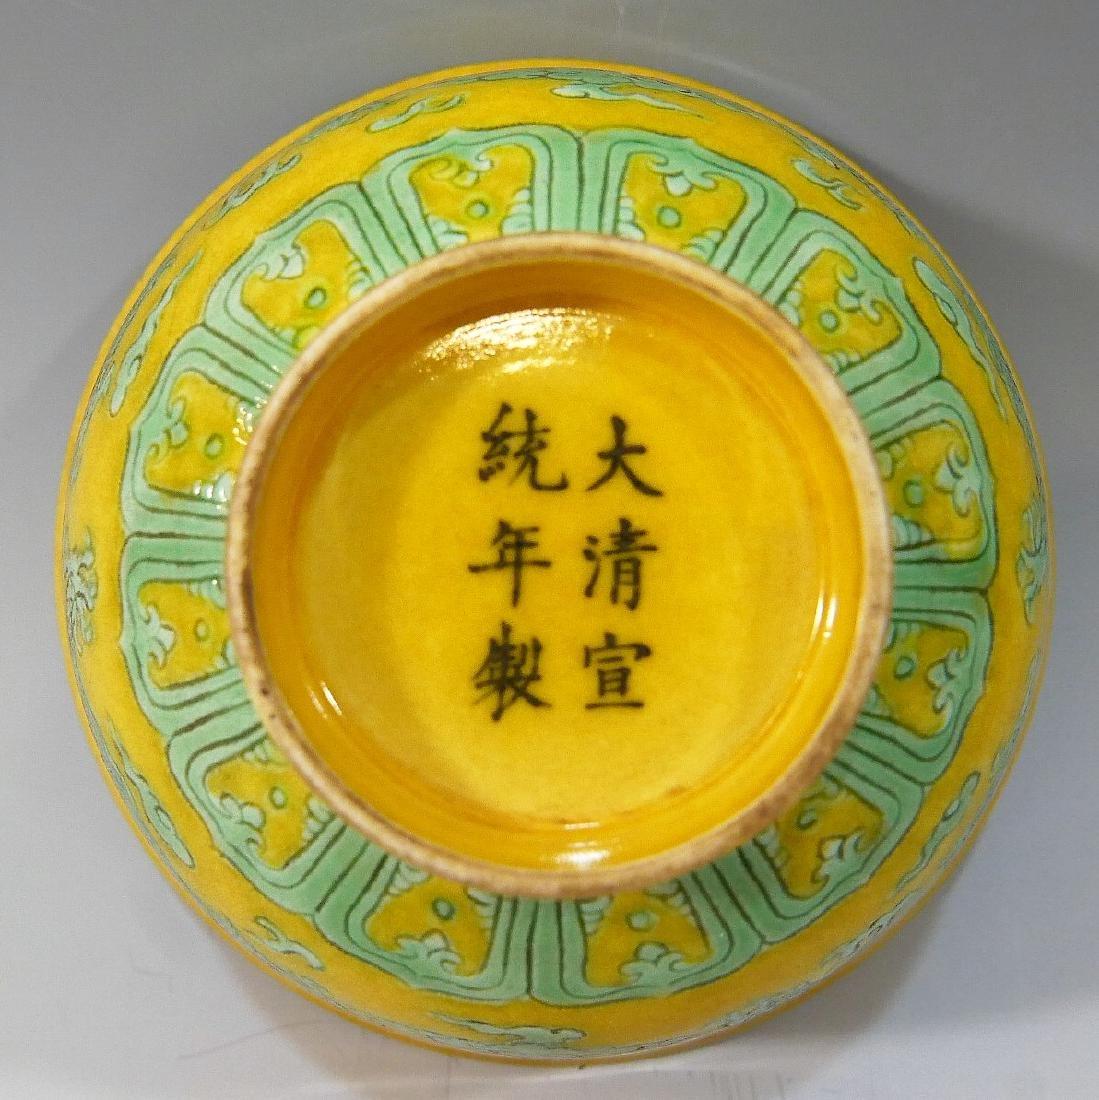 CHINESE ANTIQUE YELLOW GROUND GREEN GLAZE BOWL -